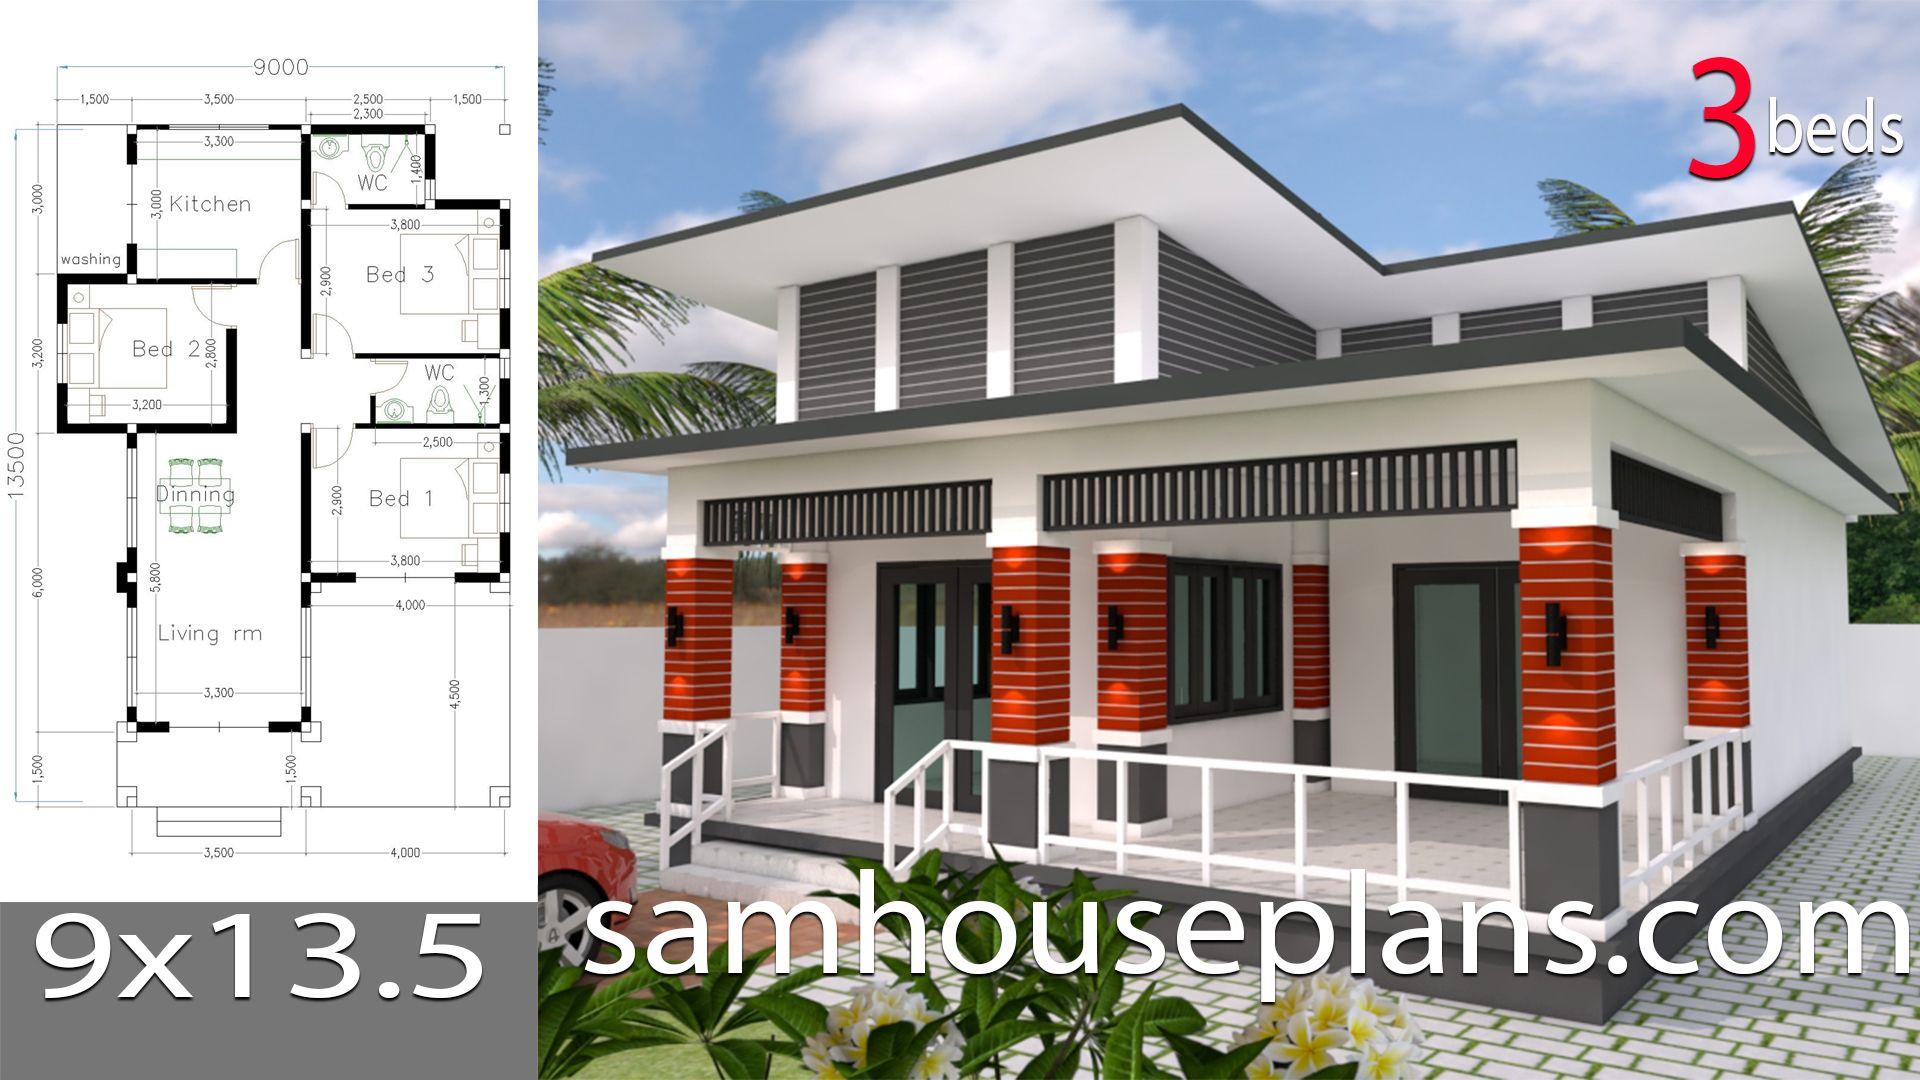 House Plans 9x13 5 With 3 Bedrooms House Plans Free Downloads Bungalow House Design Duplex House Design House Plans